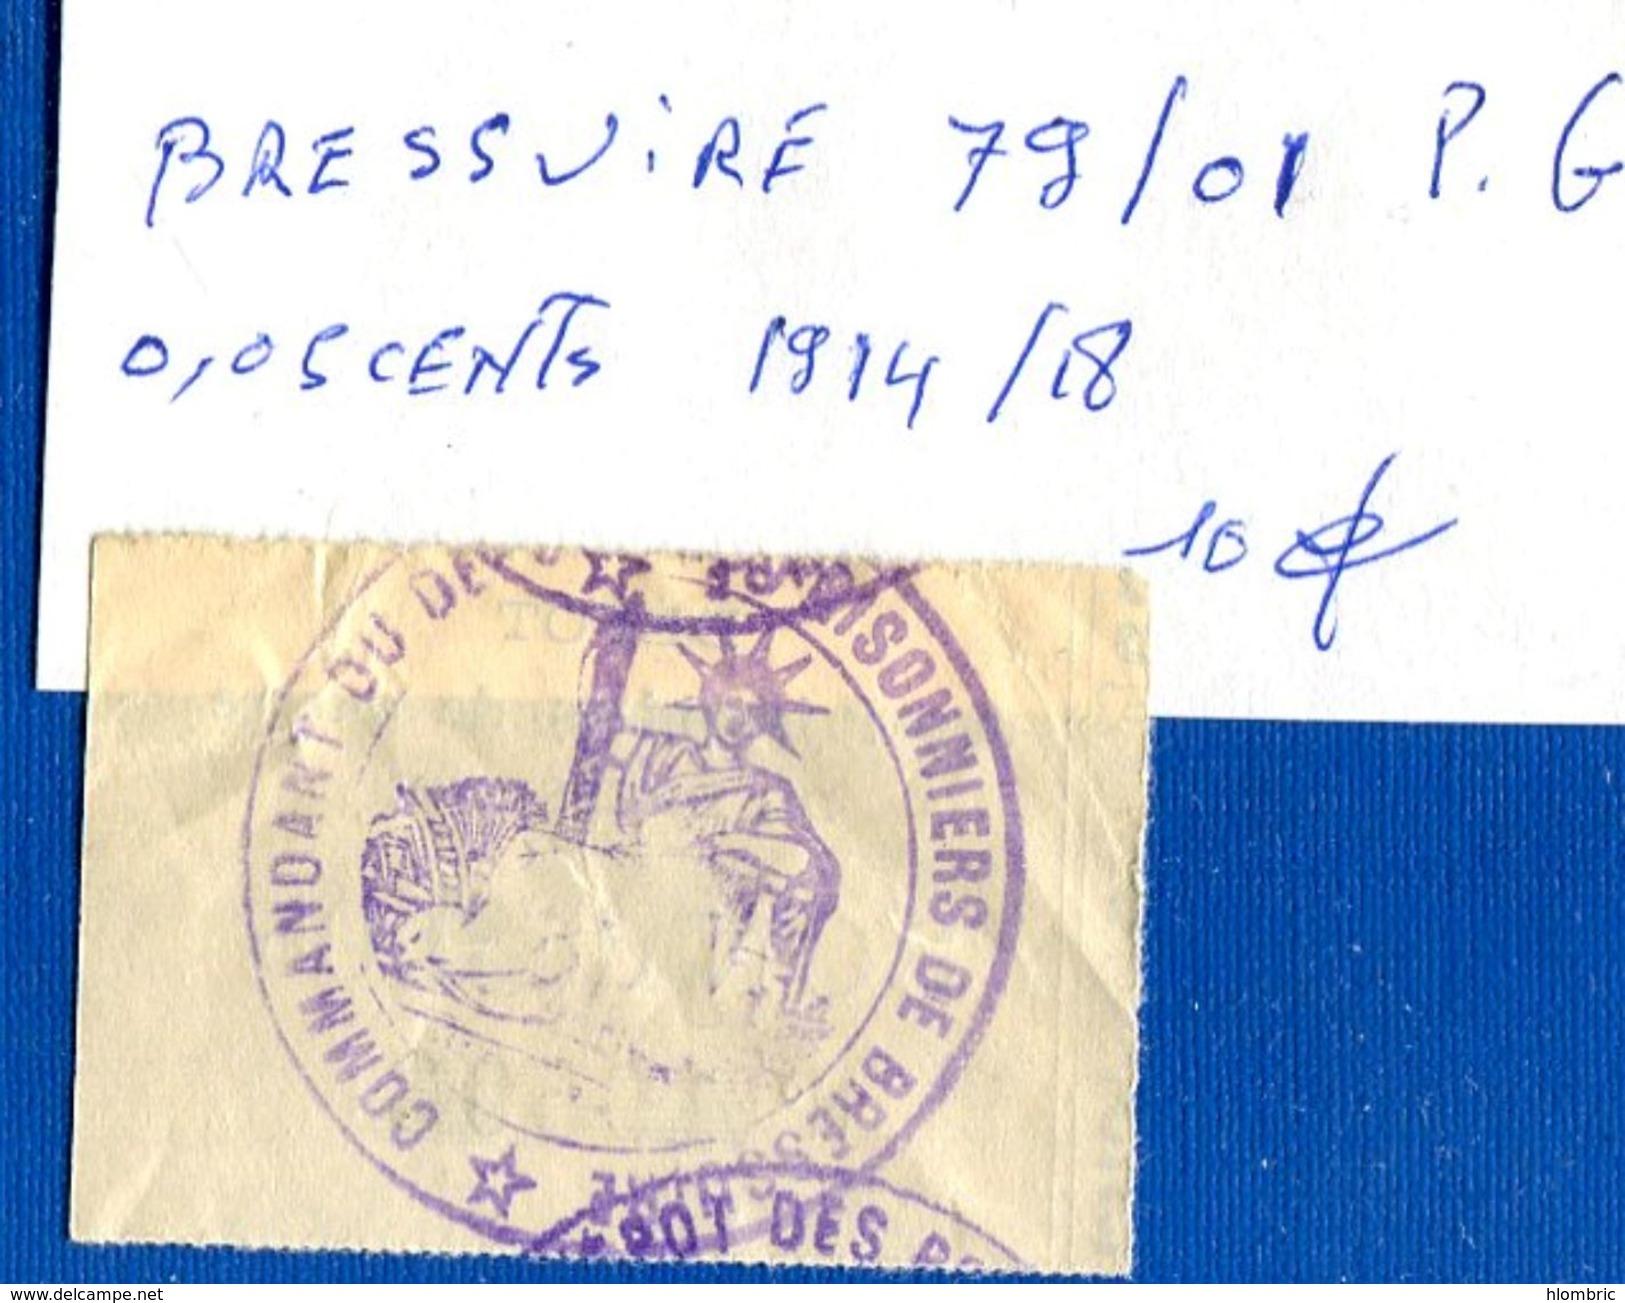 Bressuire  79/01  Pg  0.05  Cents  1914/18 - Bonds & Basic Needs